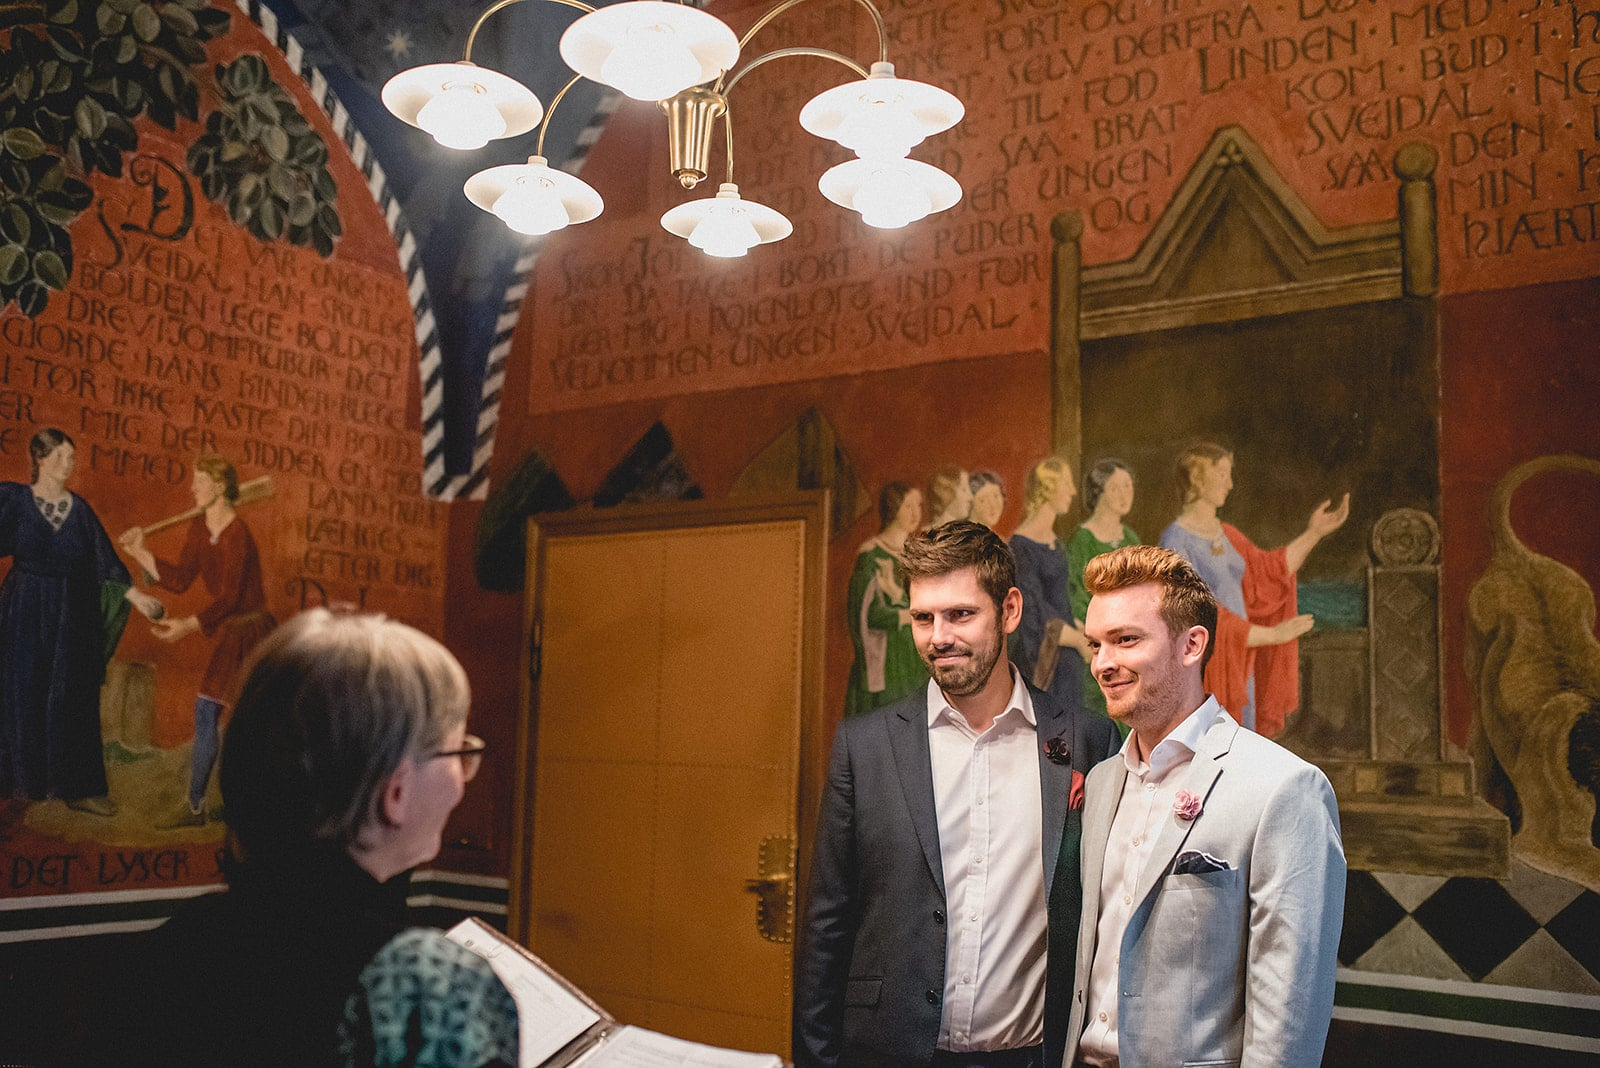 Gay couple elopement wedding ceremony at Copenhagen Rådhus